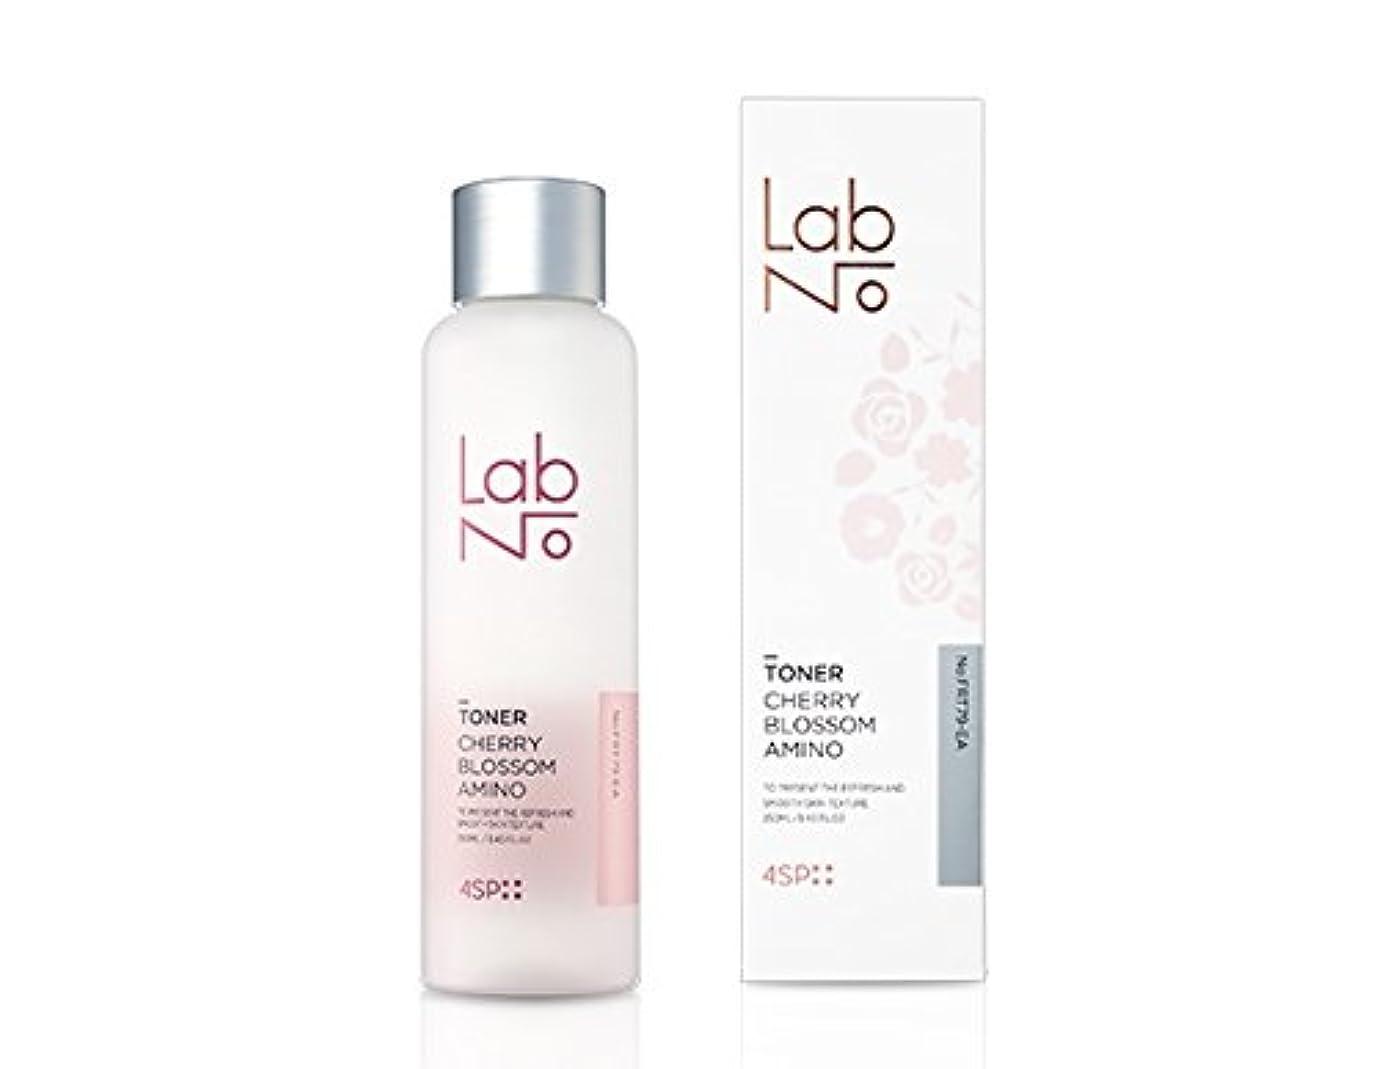 [LabNo.]4SP チェリ ブロッサム アミノ トナー/4SP Cherry Blossom Amino Toner (250ml) [並行輸入品]